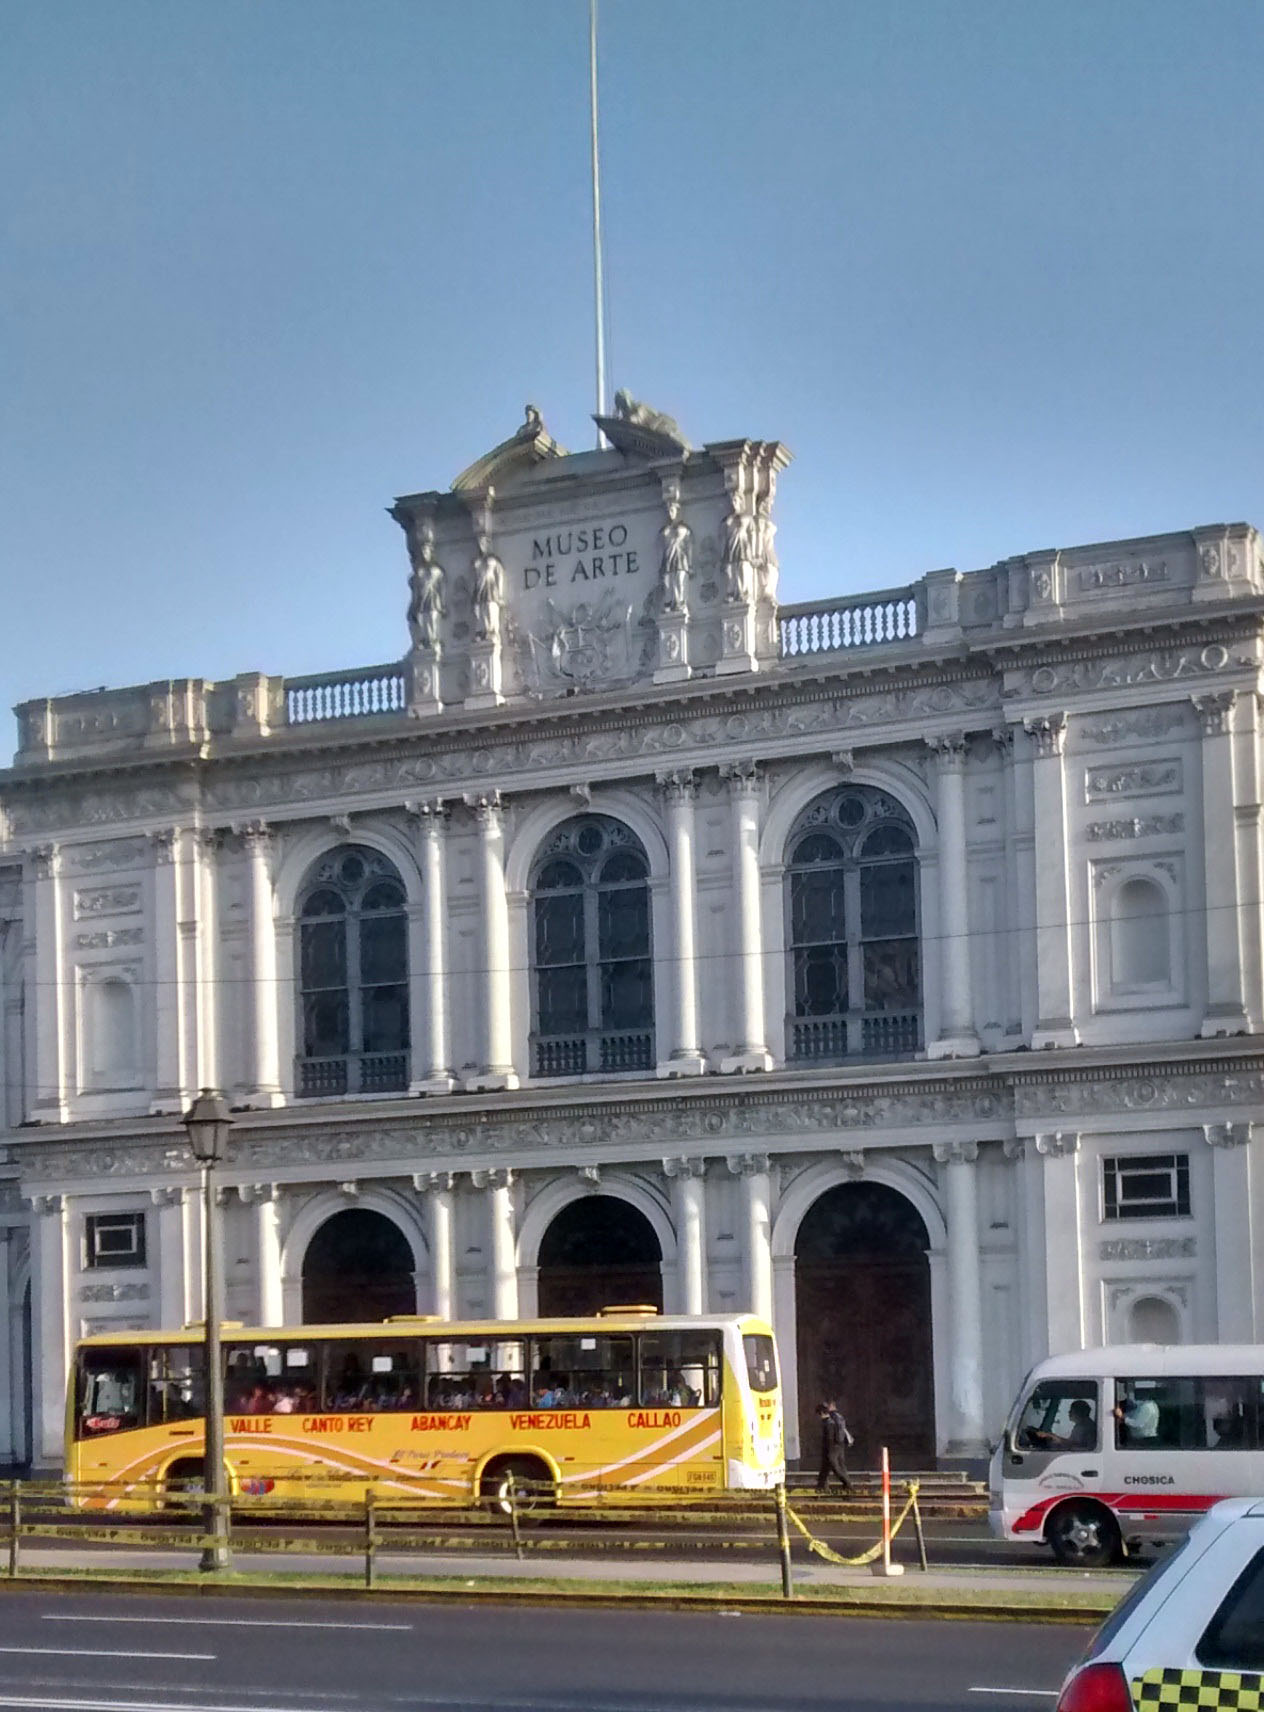 File:ENTRADA AL MUSEO DE ARTE (Lima).jpg - Wikimedia Commons